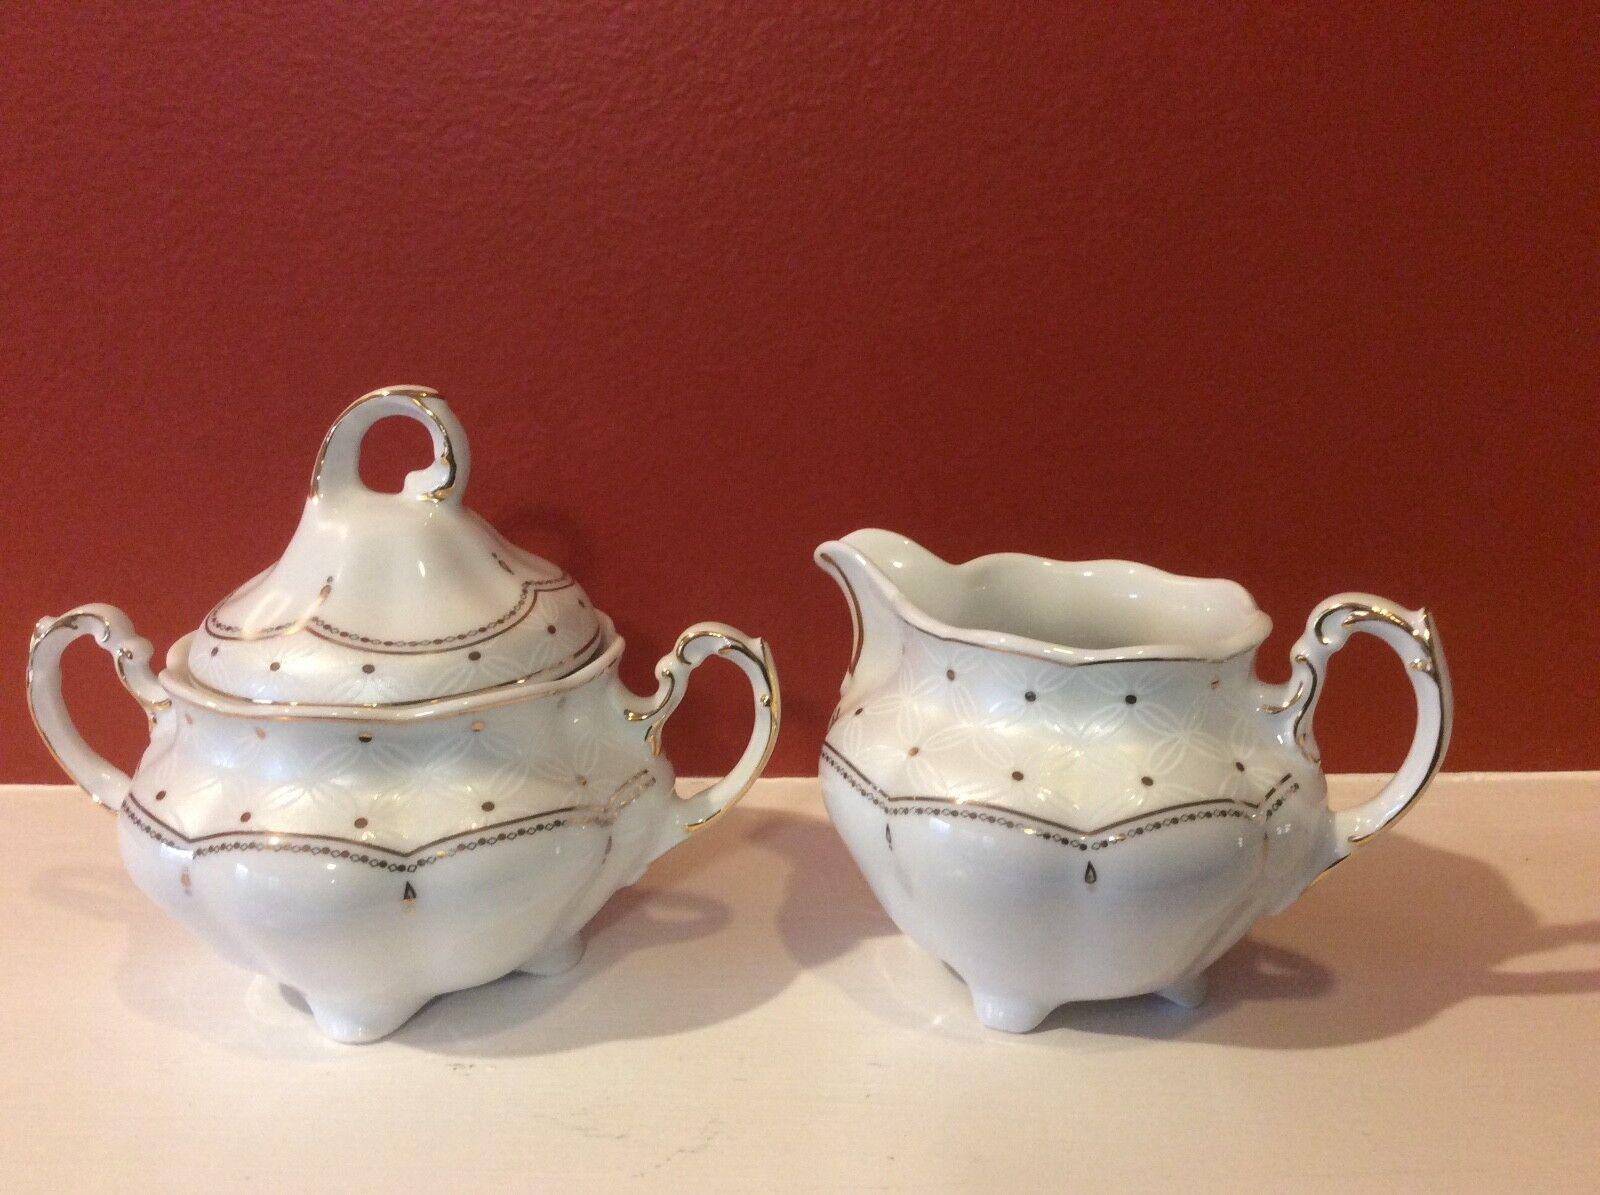 Vtg CMIELOW Porcelain Sugar Bowl Lid Creamer Kaffee Ginger Jar Christmas 3pc Set